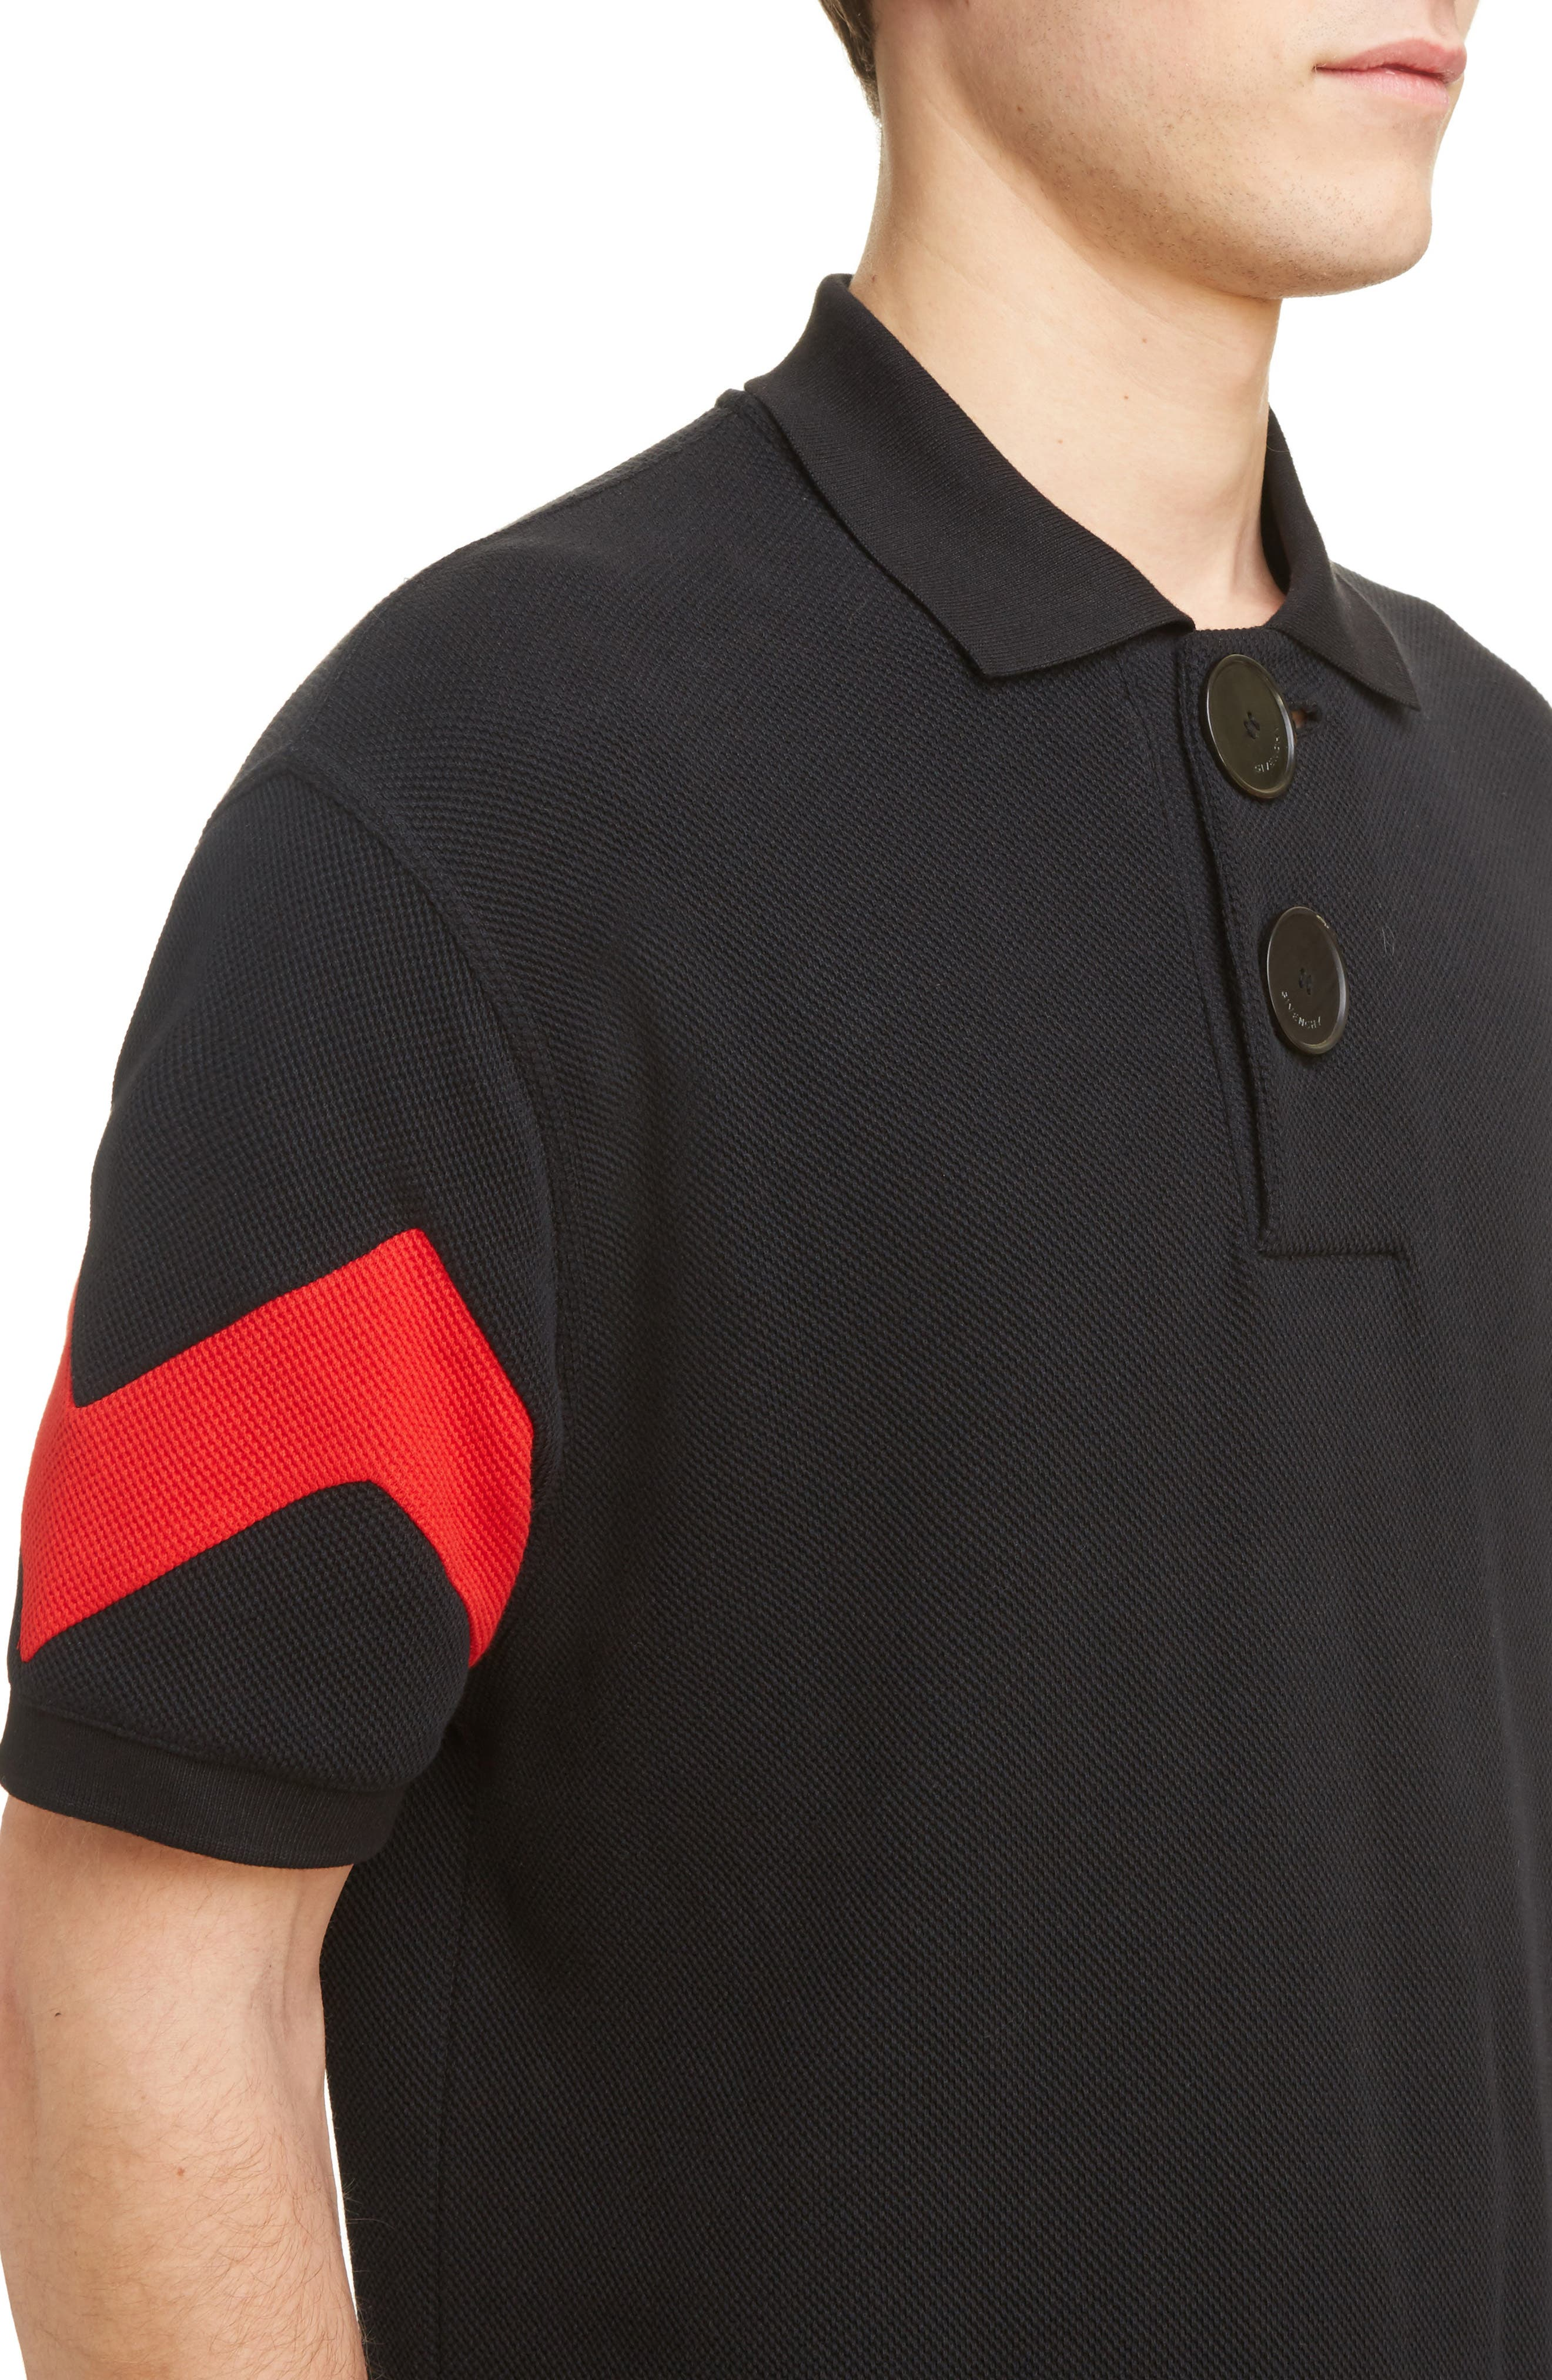 Cuban Fit Stripe Sleeve Polo,                             Alternate thumbnail 4, color,                             Black